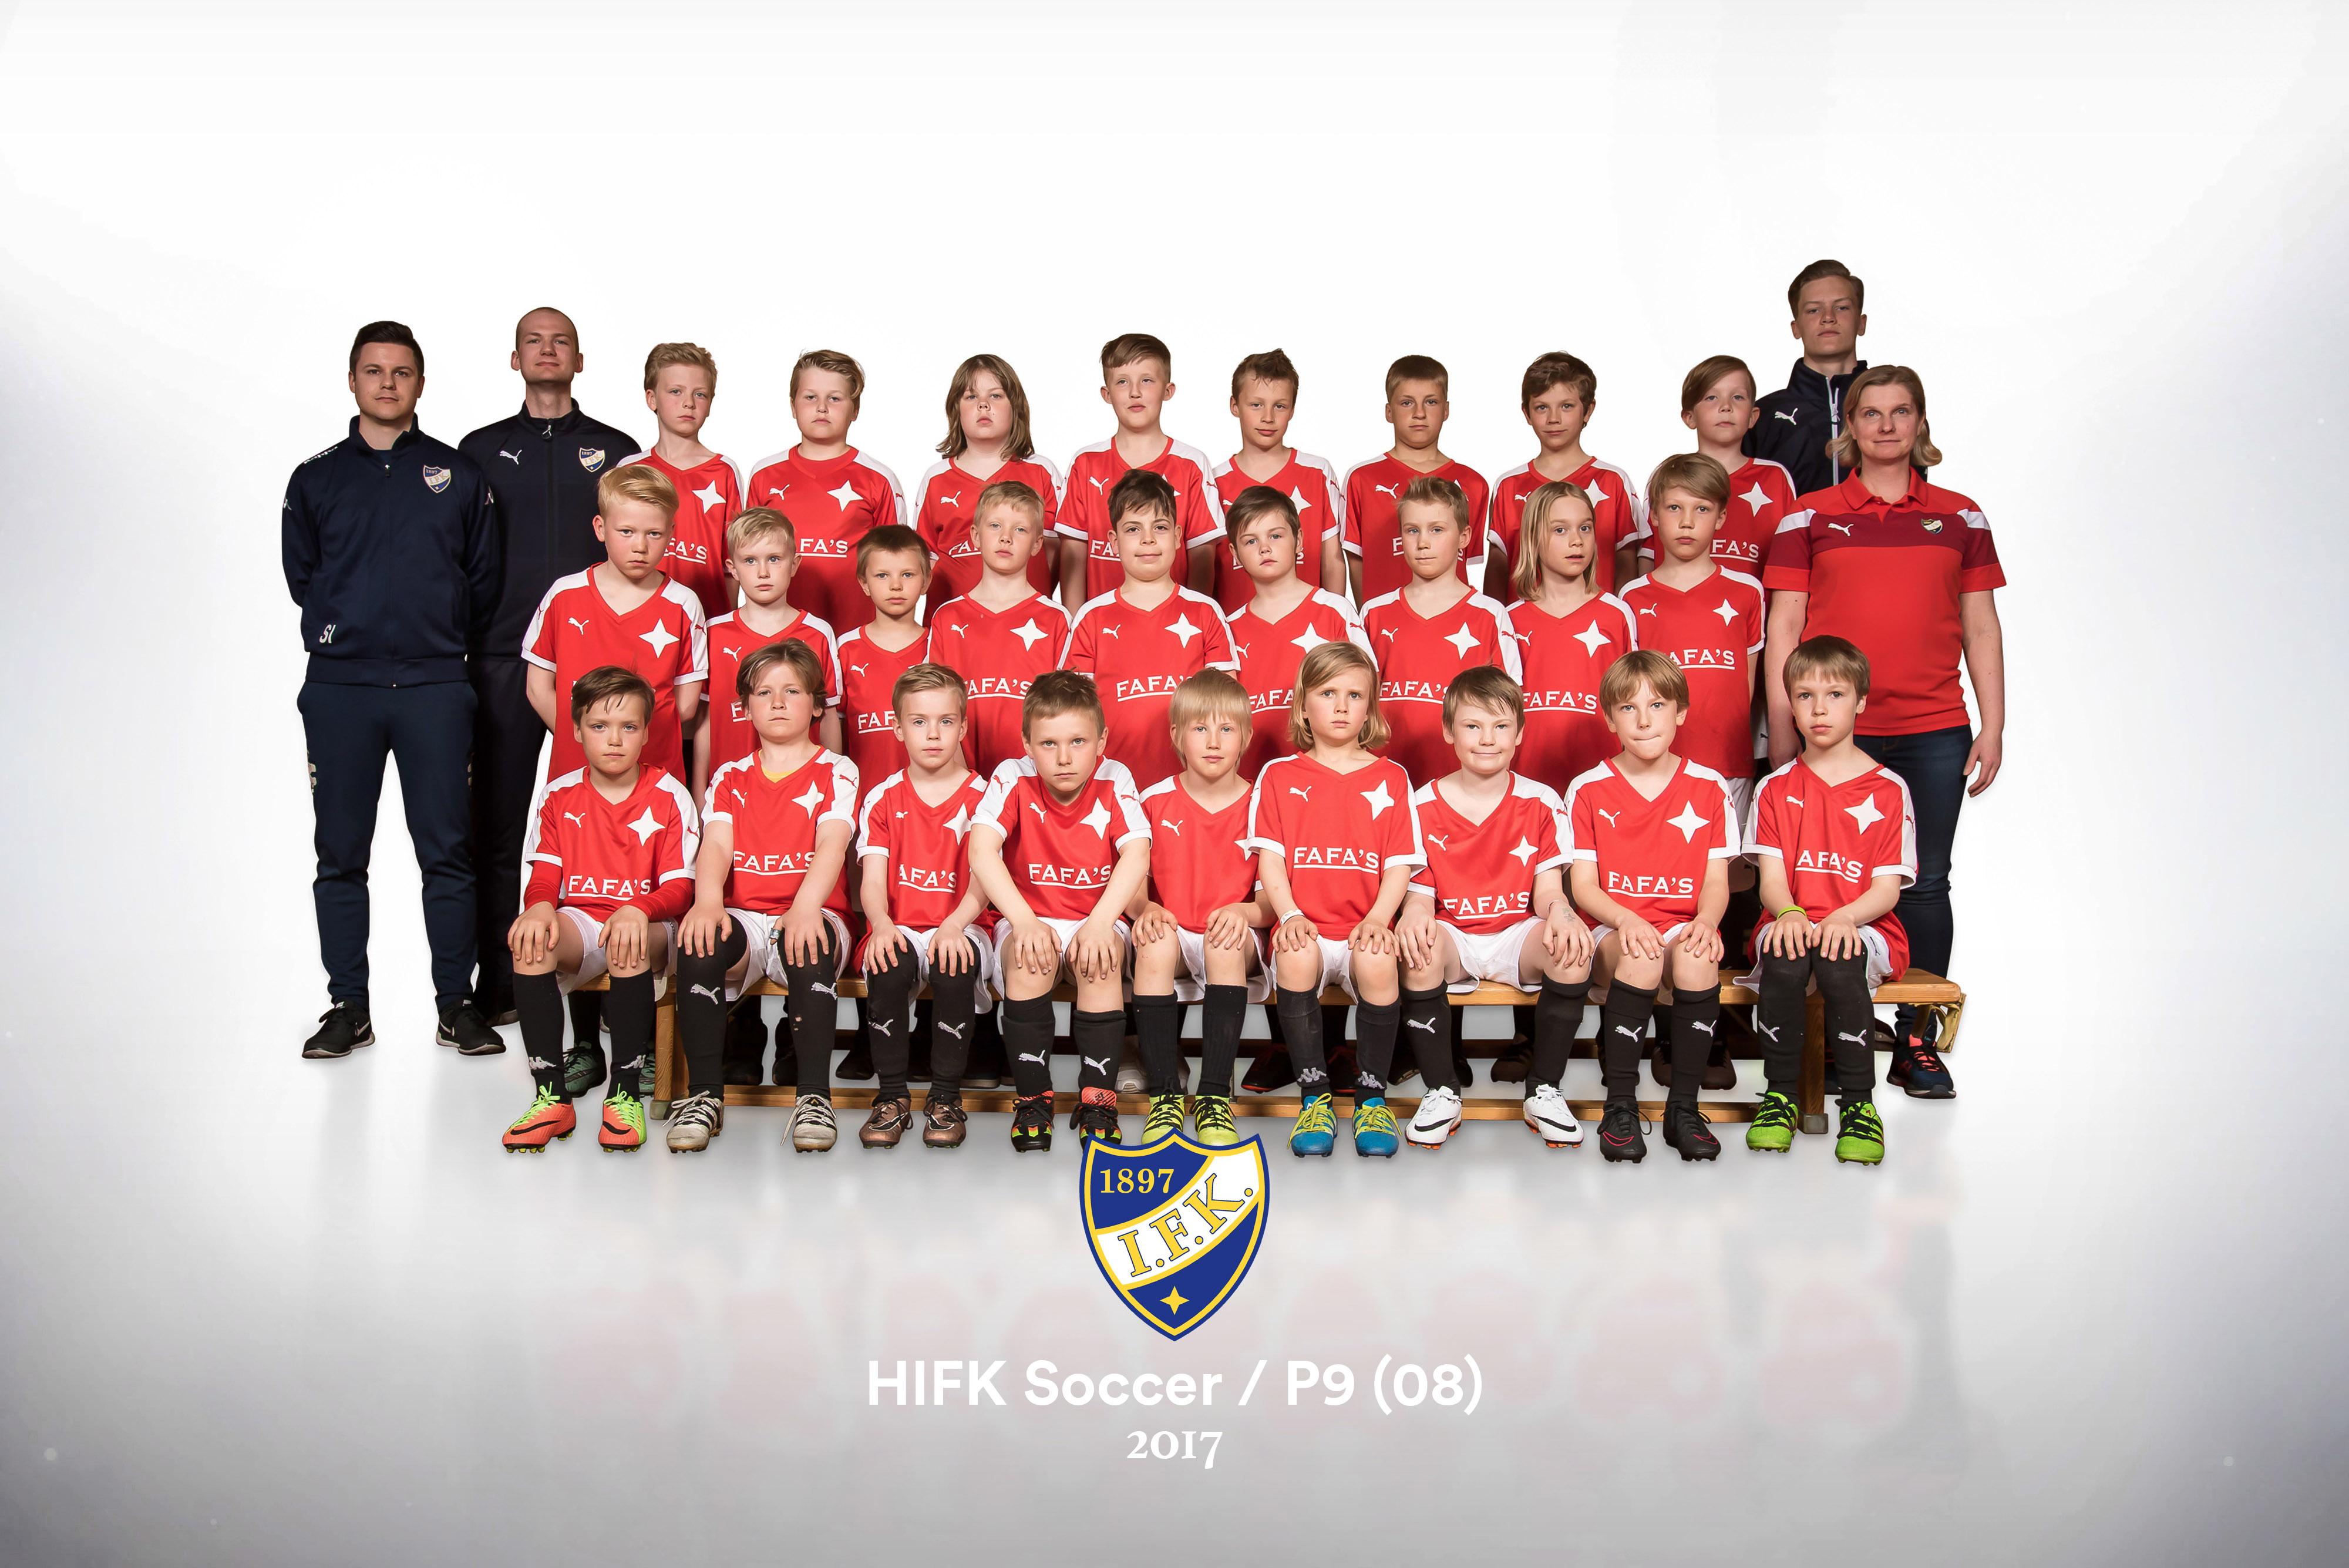 HIFK08 5/2017